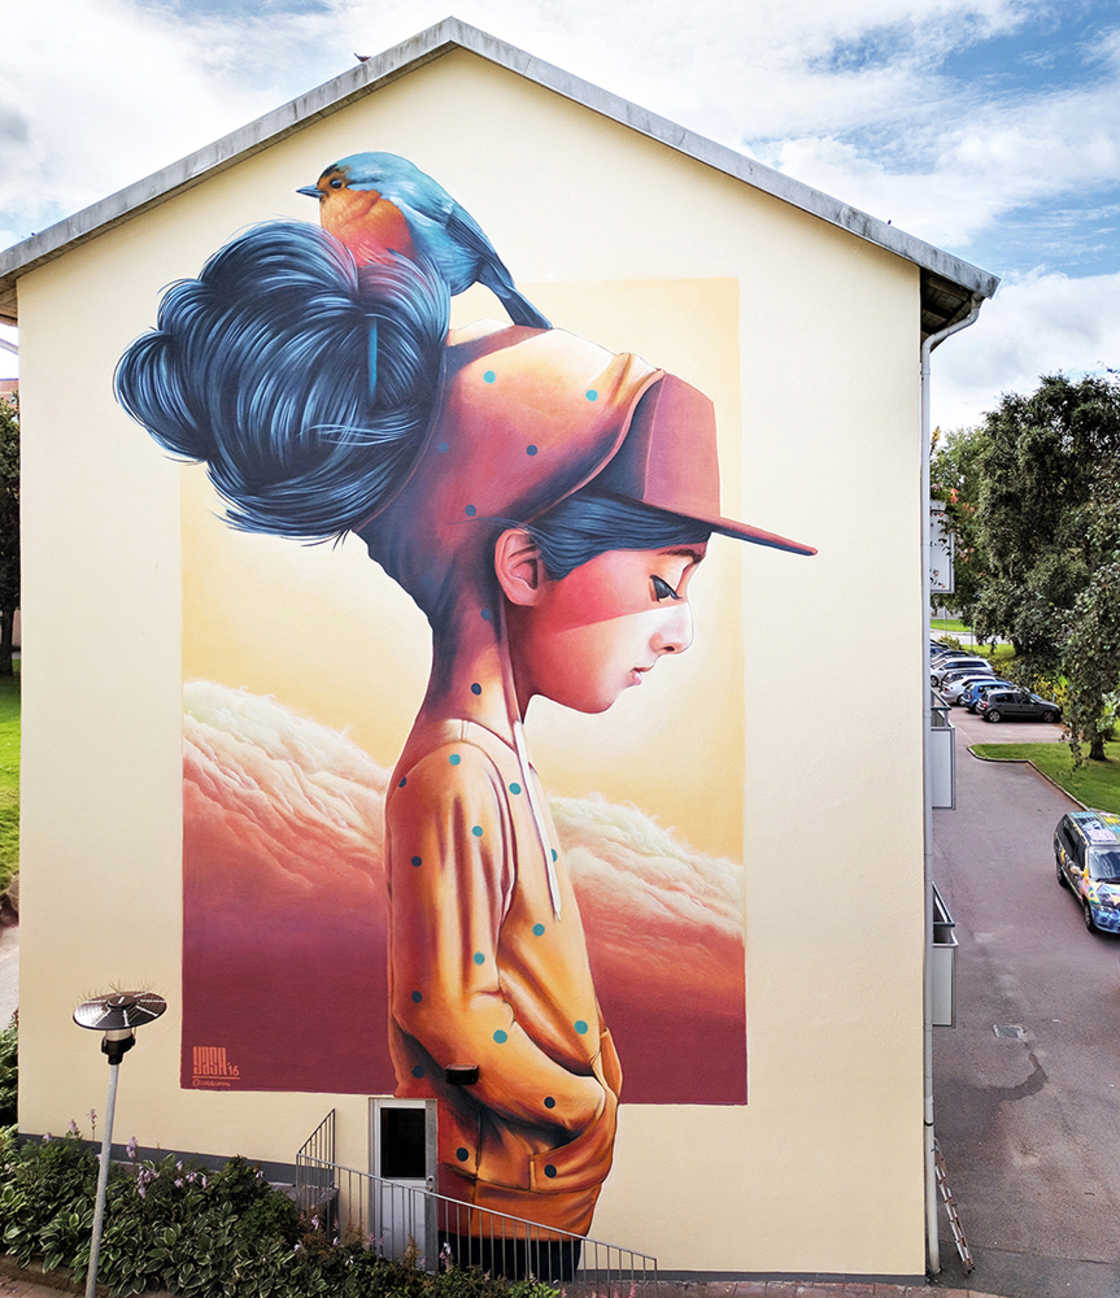 yash-one-street-art-15.jpg